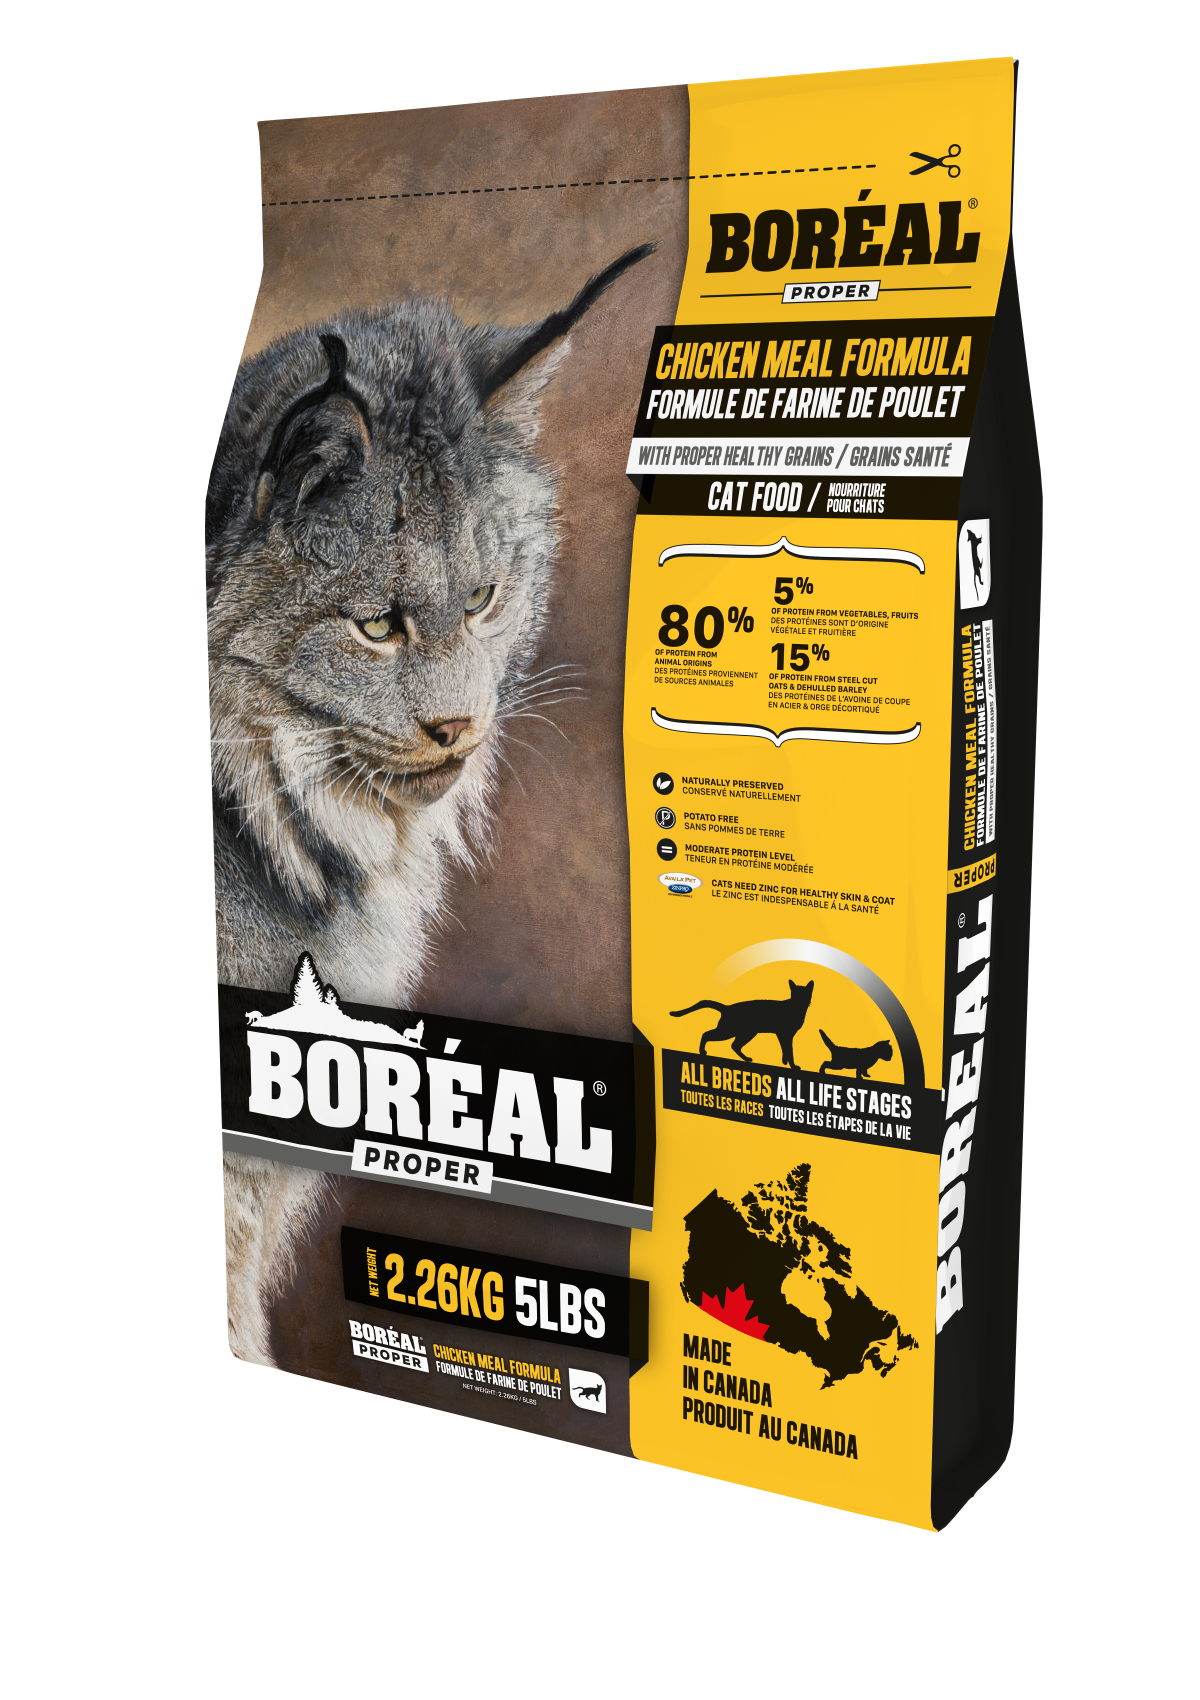 Boreal Proper Chicken Meal Low Carb Grains Dry Cat Food, 2.26kg bag